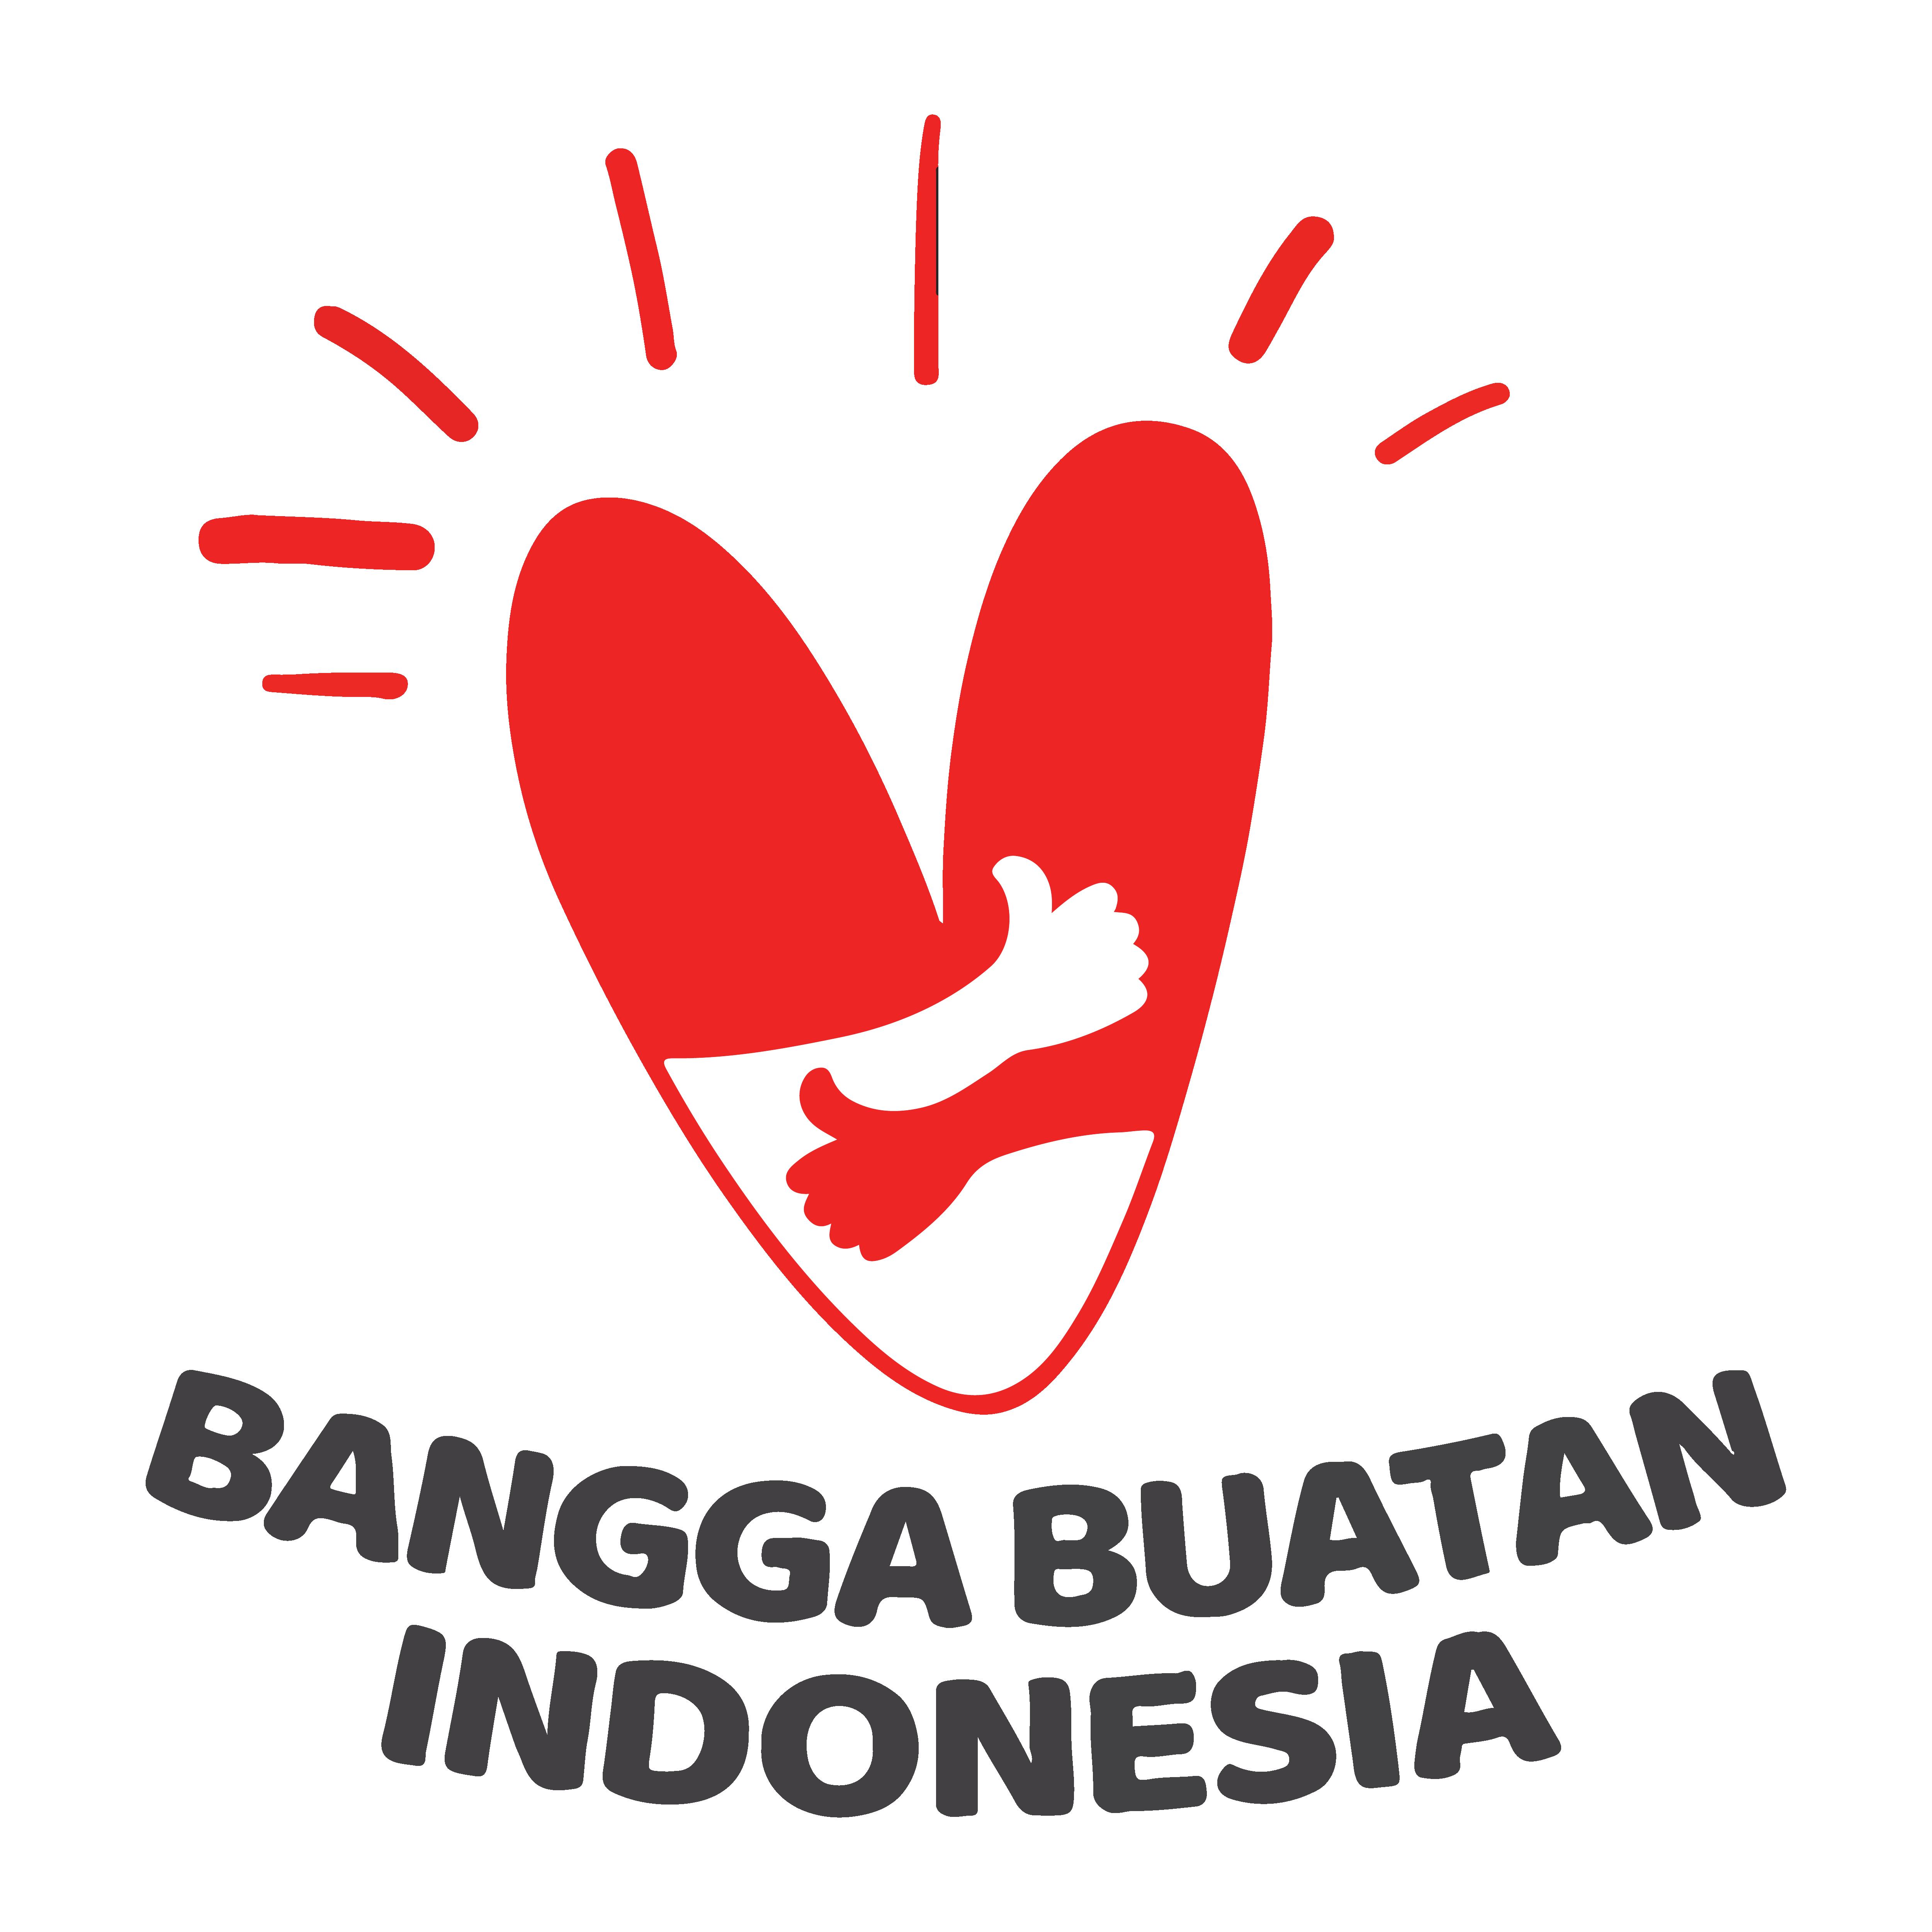 Logo Bangga Buatan Indonesia vector cdr, ai, eps, png di